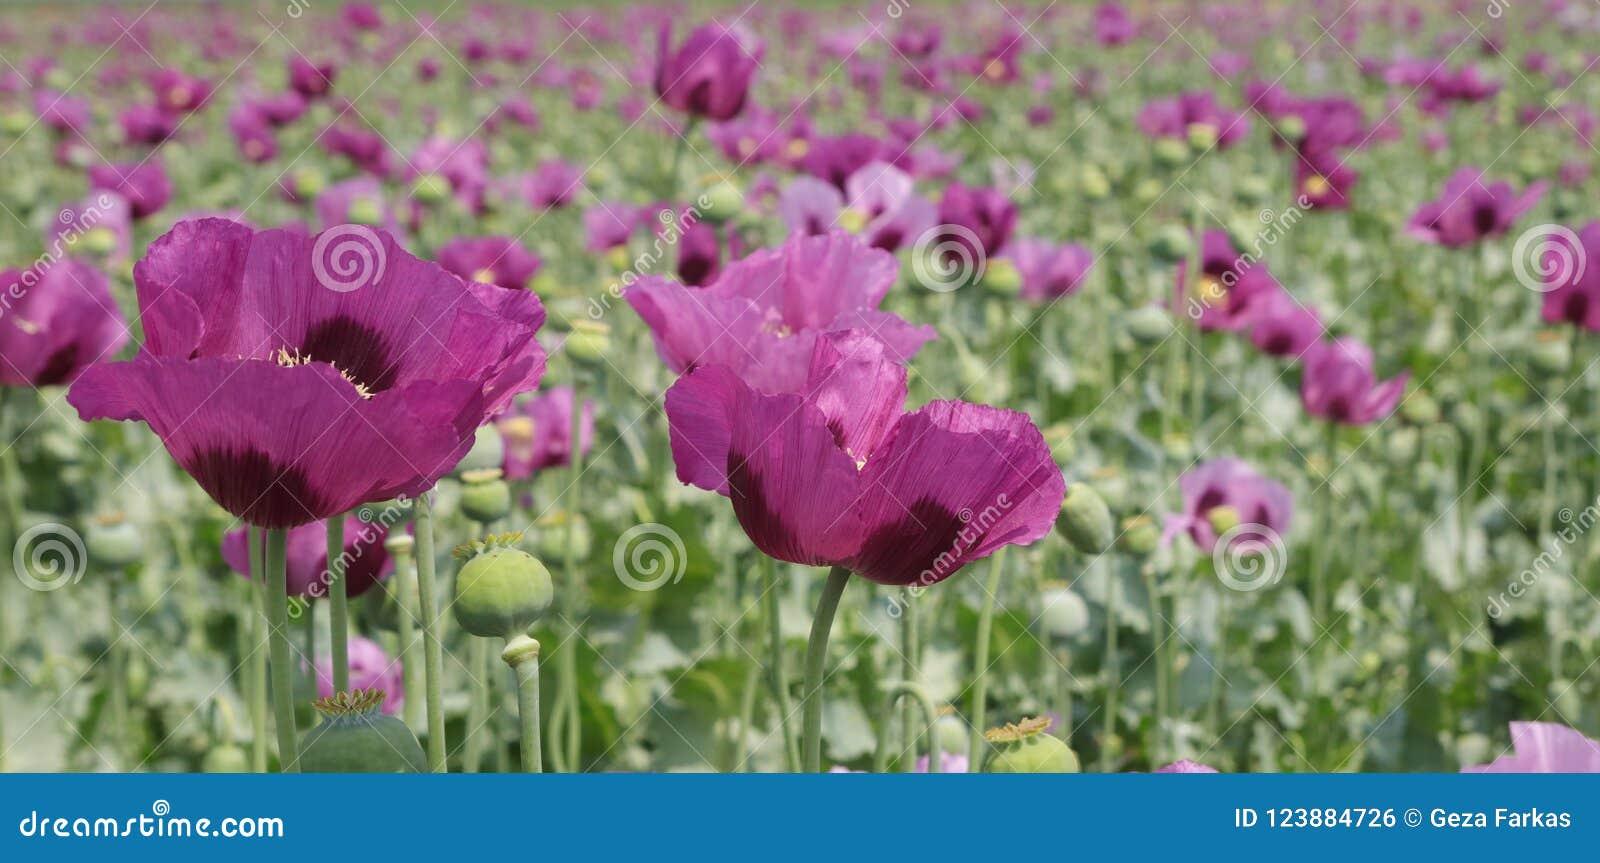 Papaver Somniferum Opium Poppy Field Stock Photo Image Of Flower